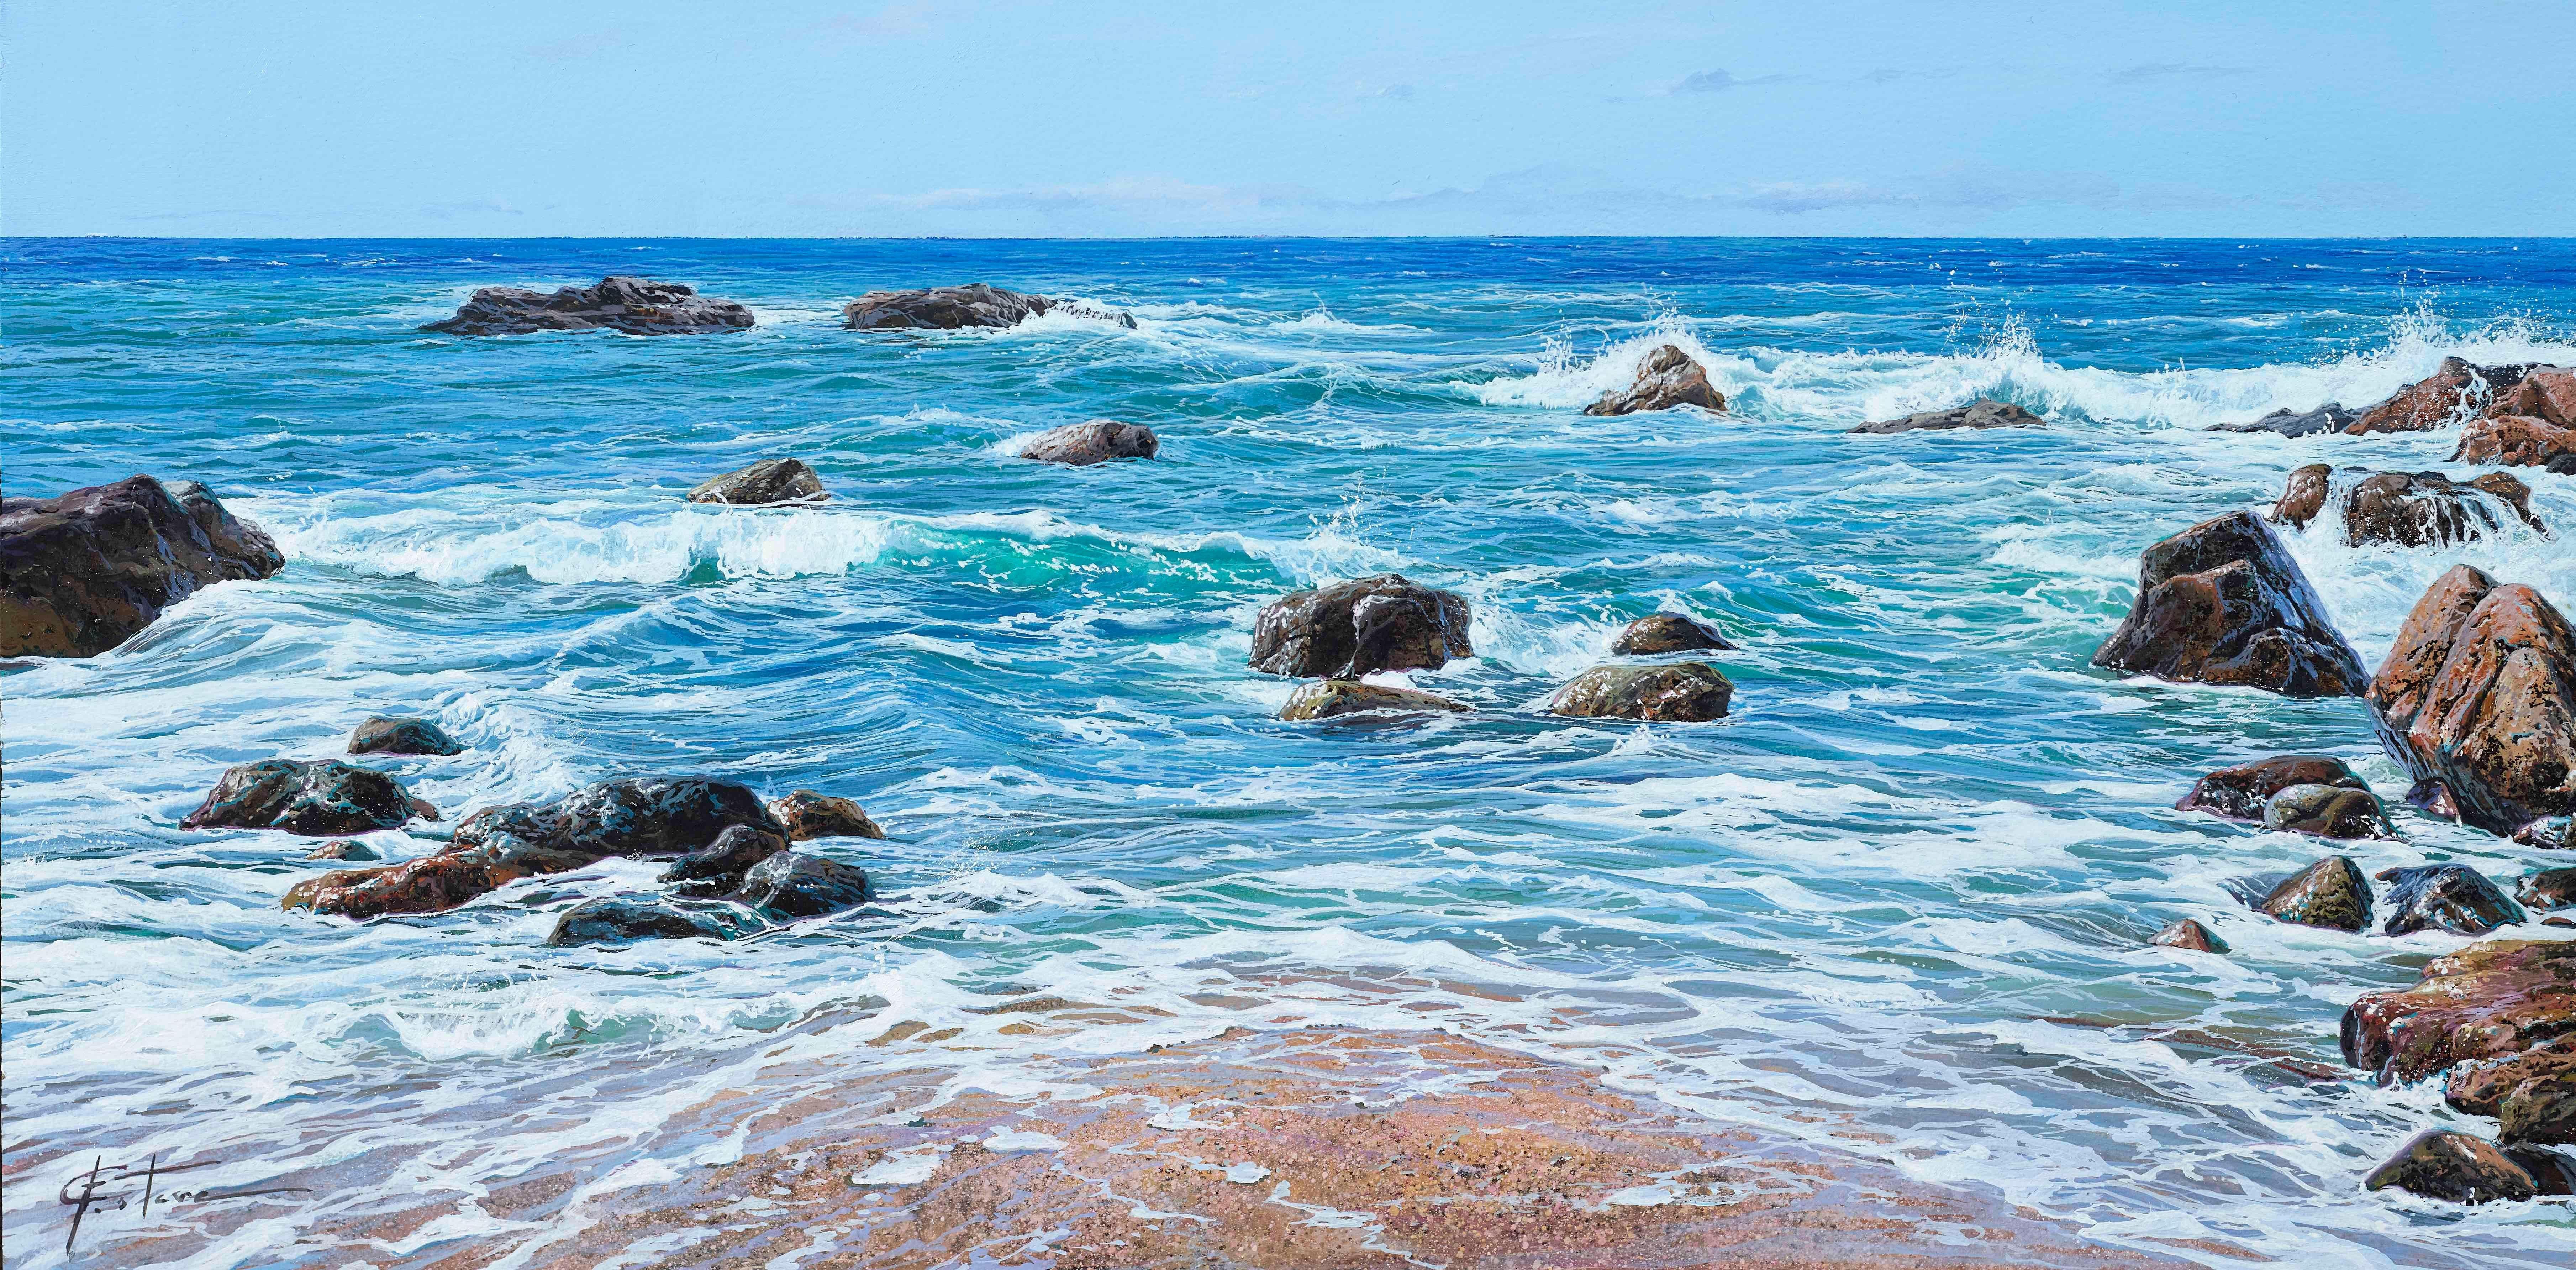 'Atlantic Coast' Hyperrealist Painting of the sea and rocks. Vivid Blue colour